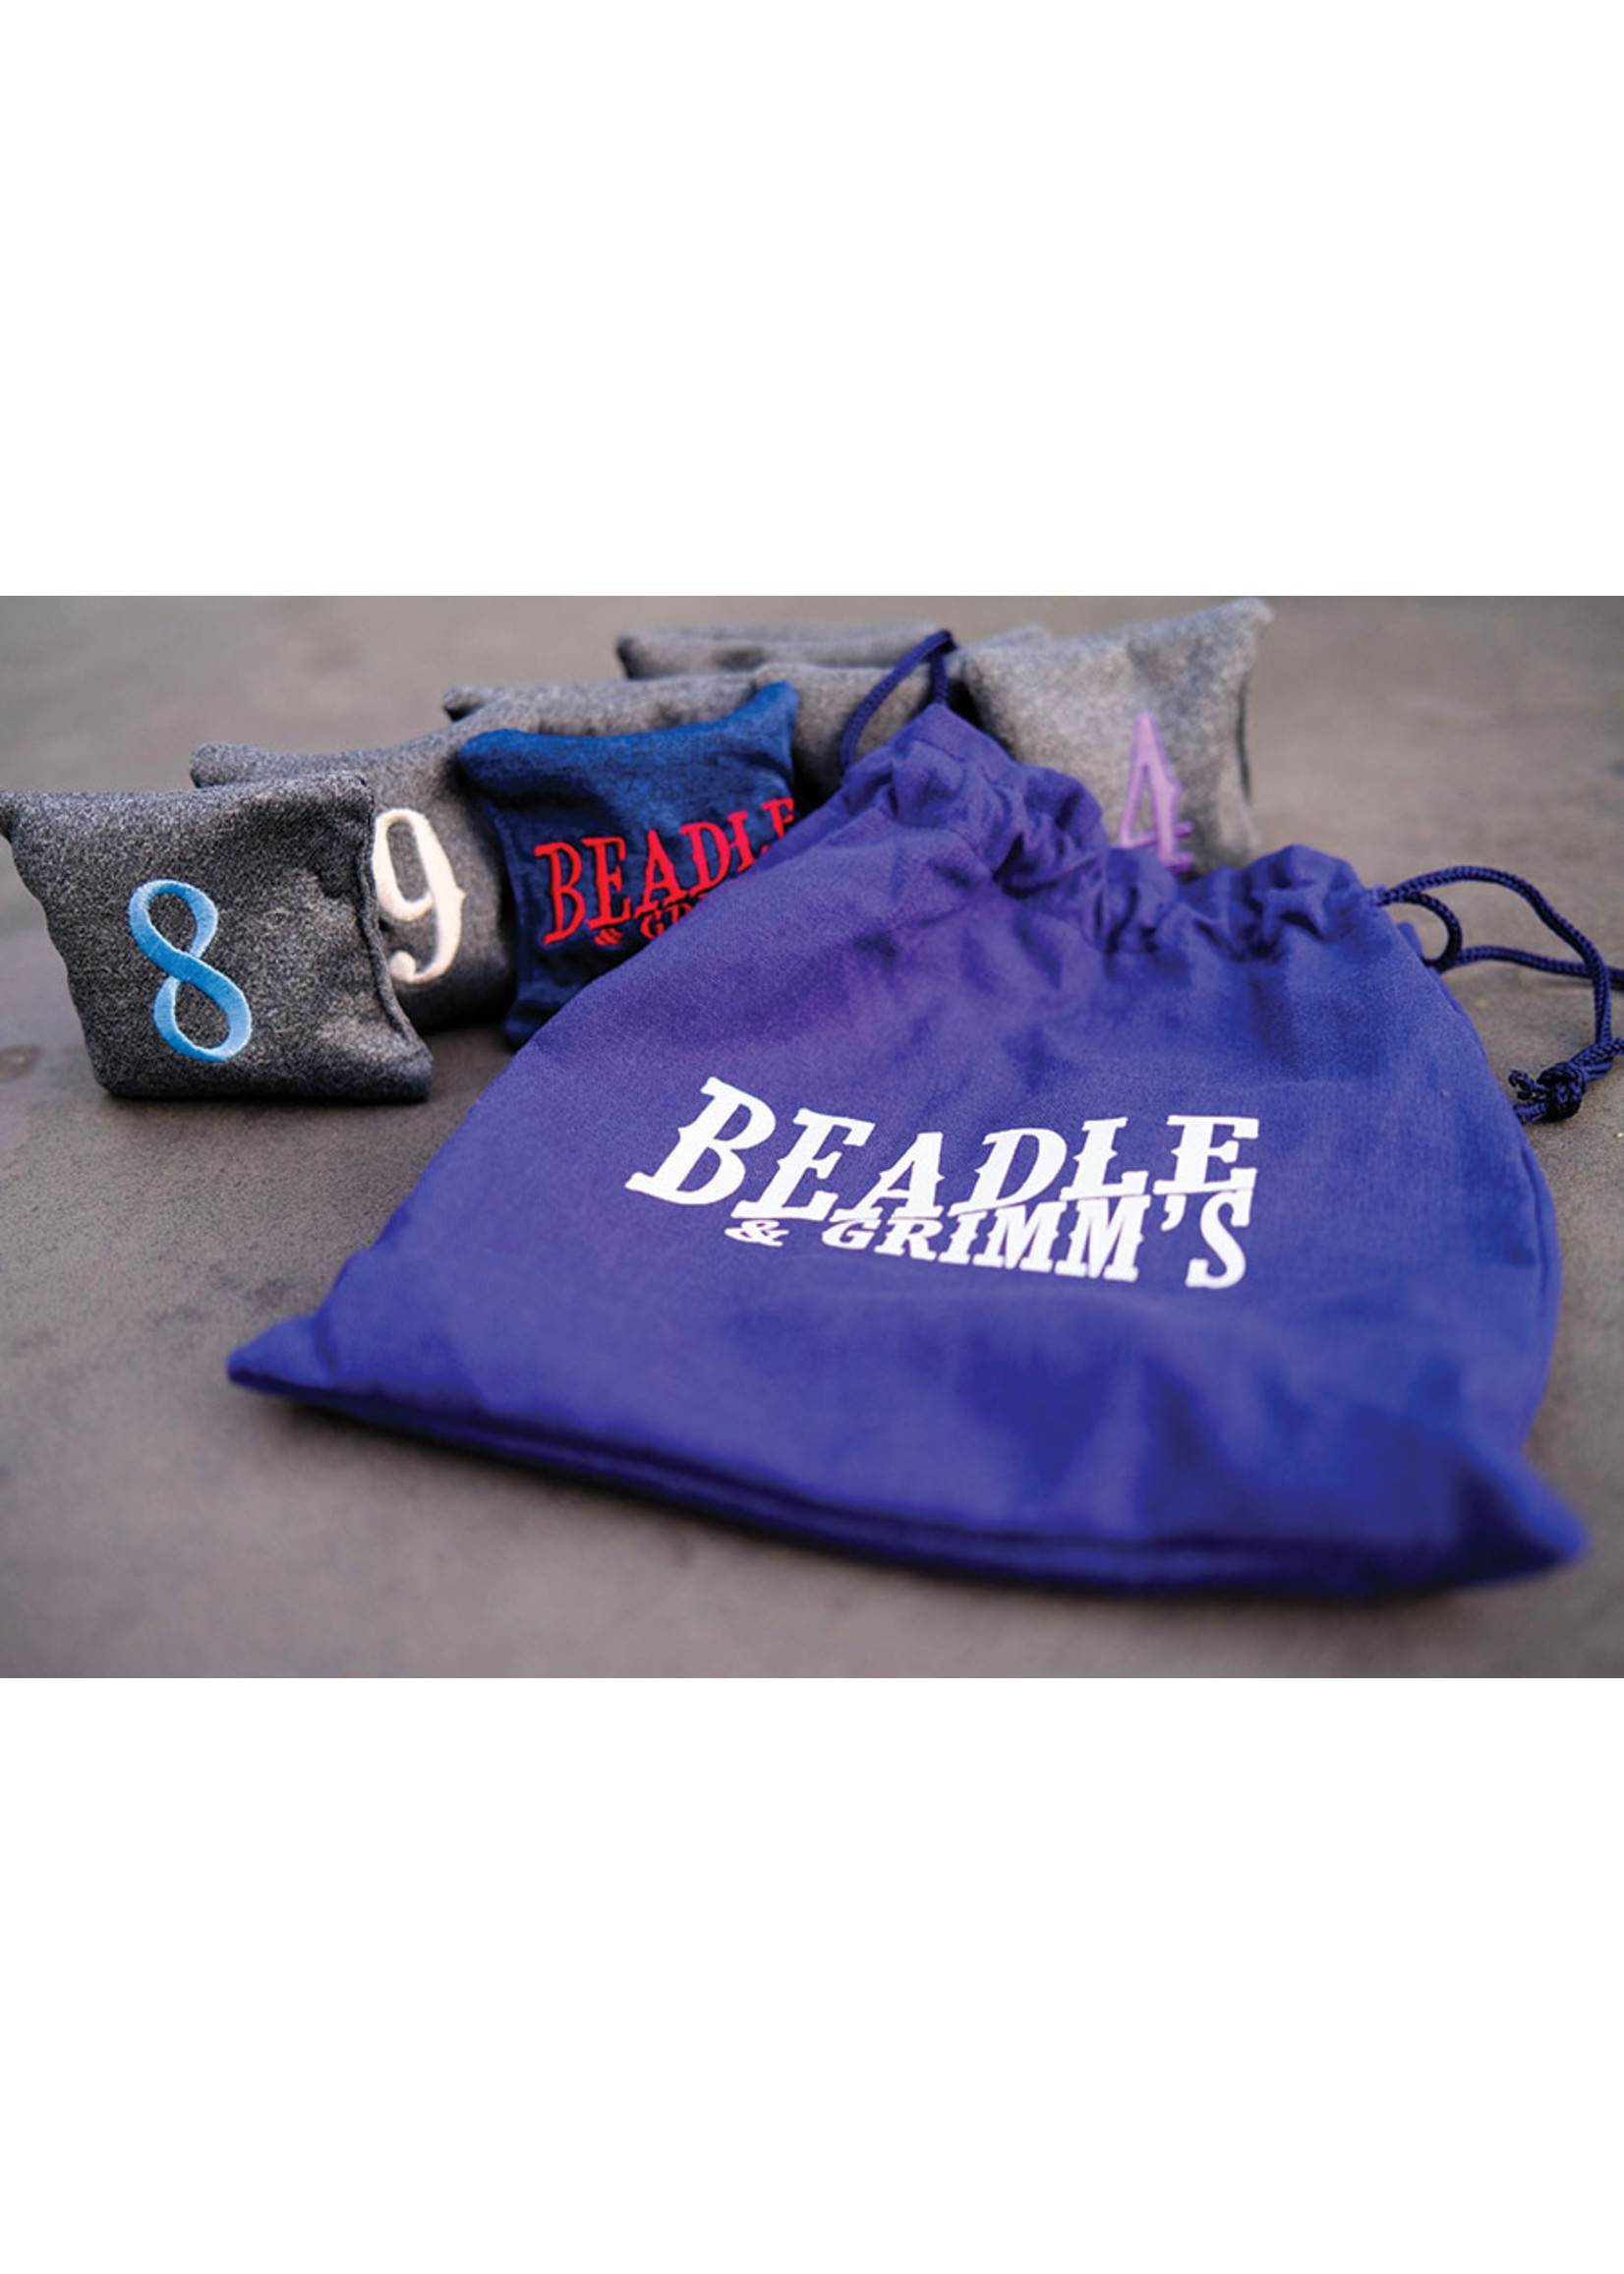 Beadle and Grimm's LLC Roll Inish! Initiative Bean Bag Set